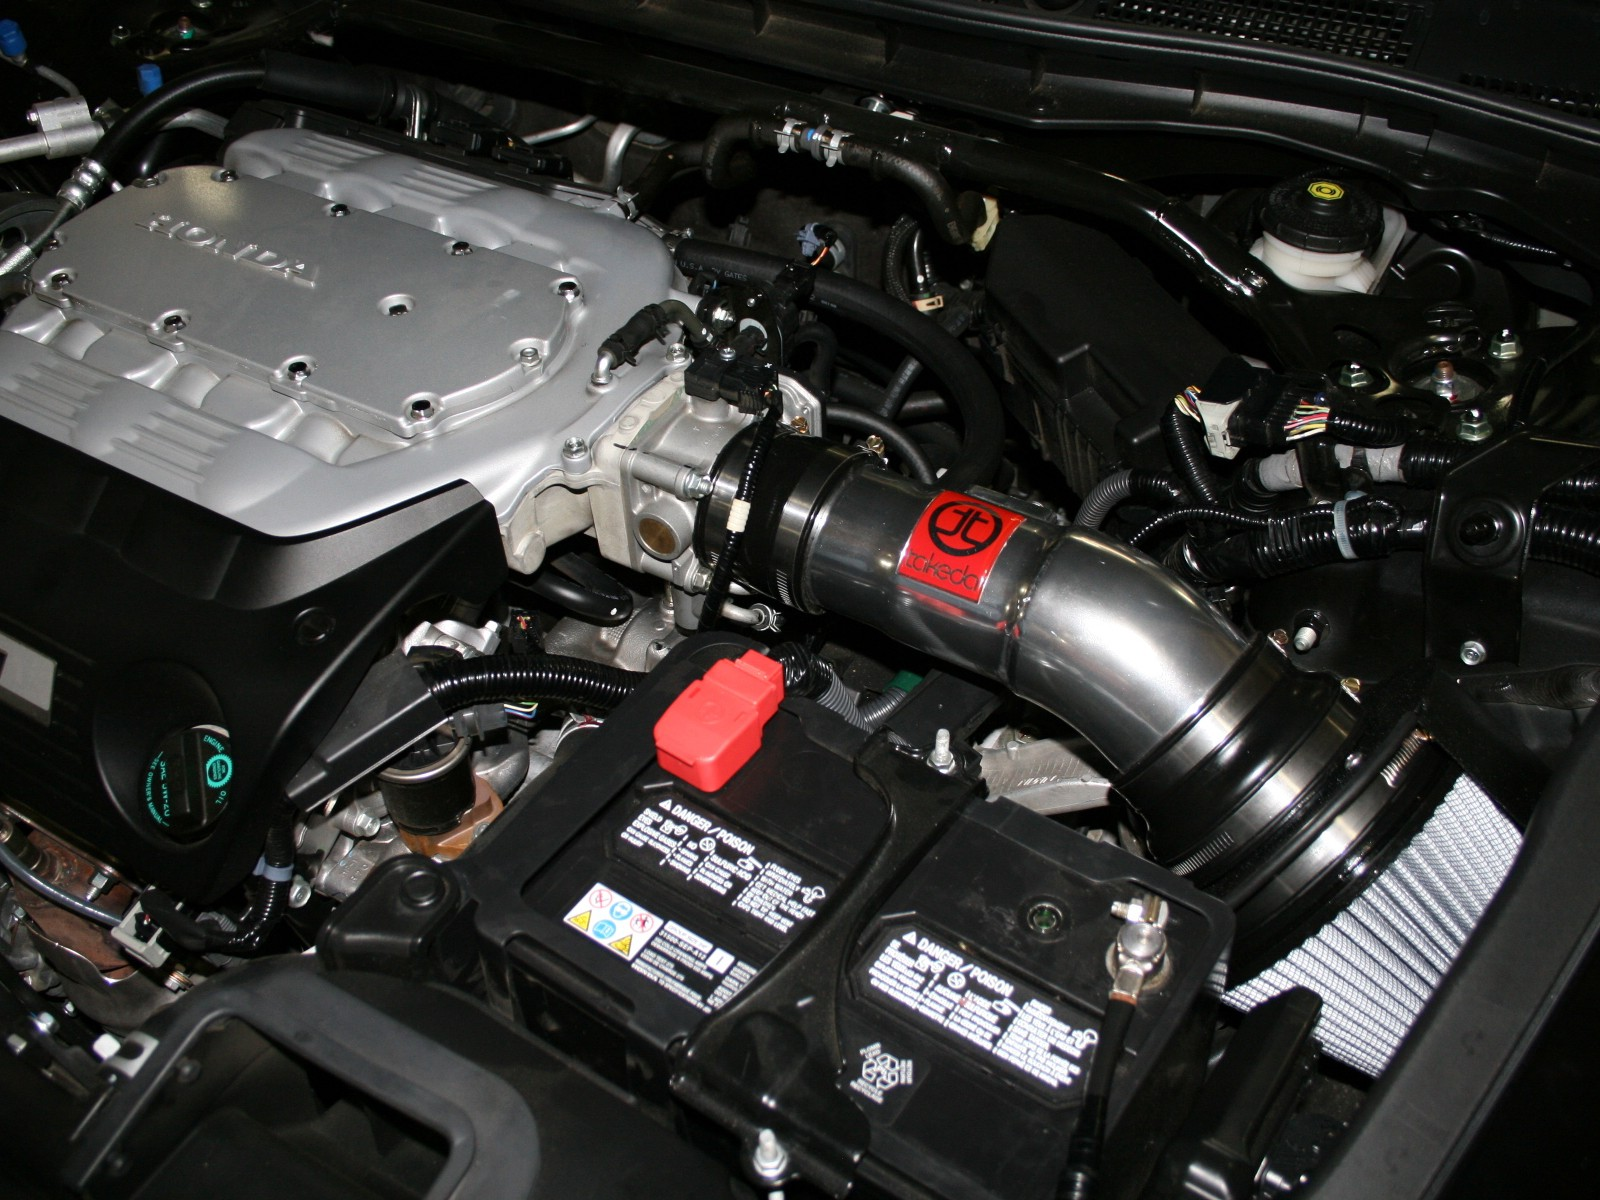 fit 2008-2012 HONDA ACCORD CROSSTOUR 3.5L V6 COLD AIR INTAKE KIT